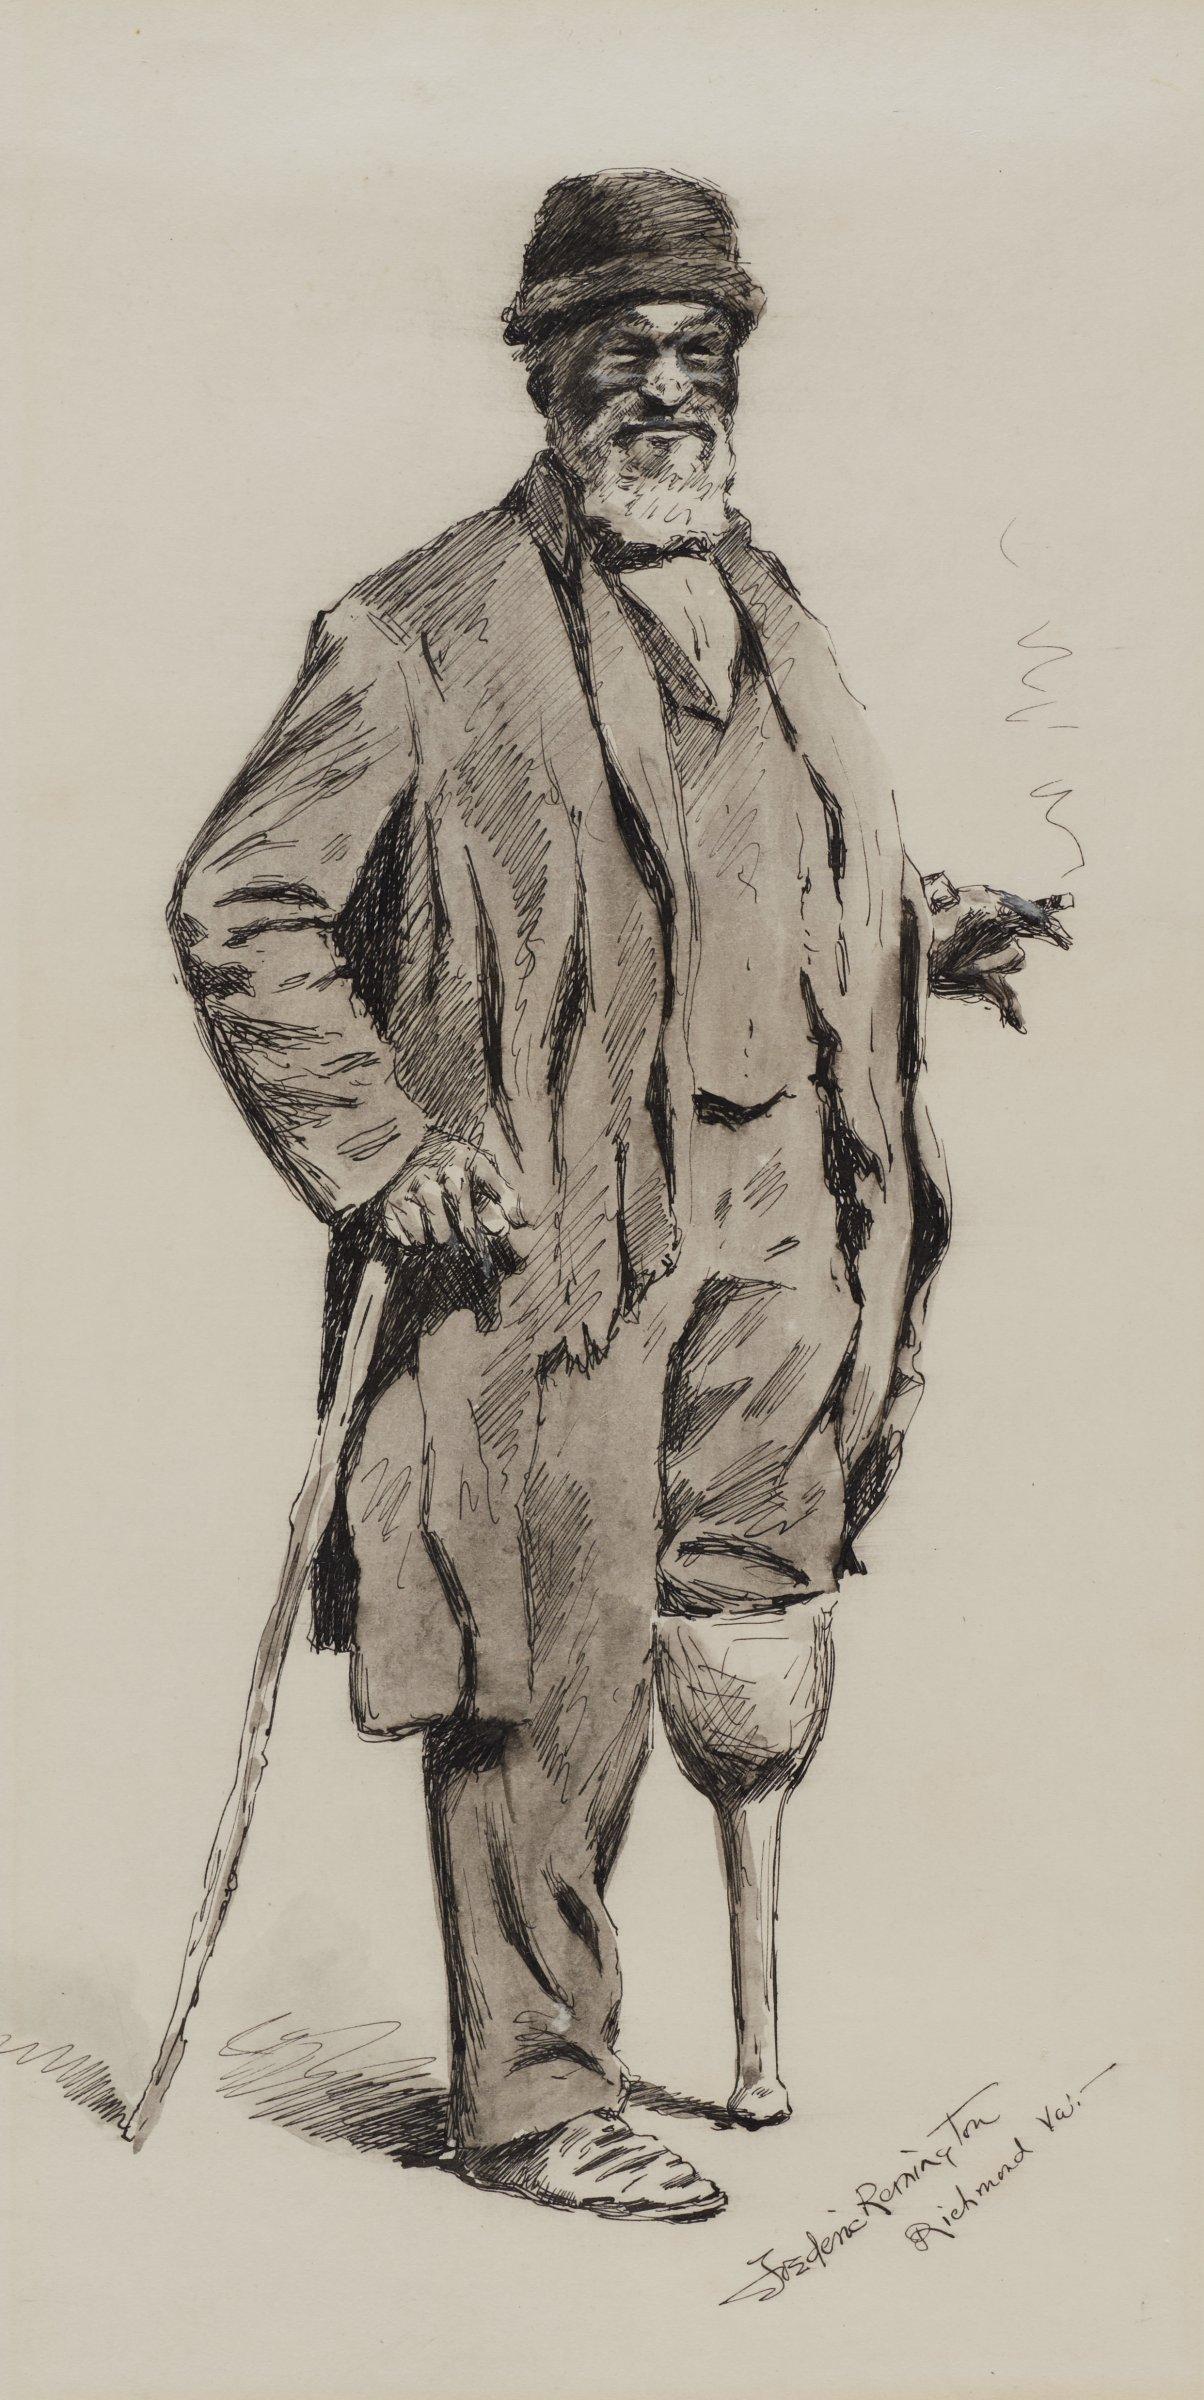 A Relic (Peg Leg), Frederic Remington, pen and black ink